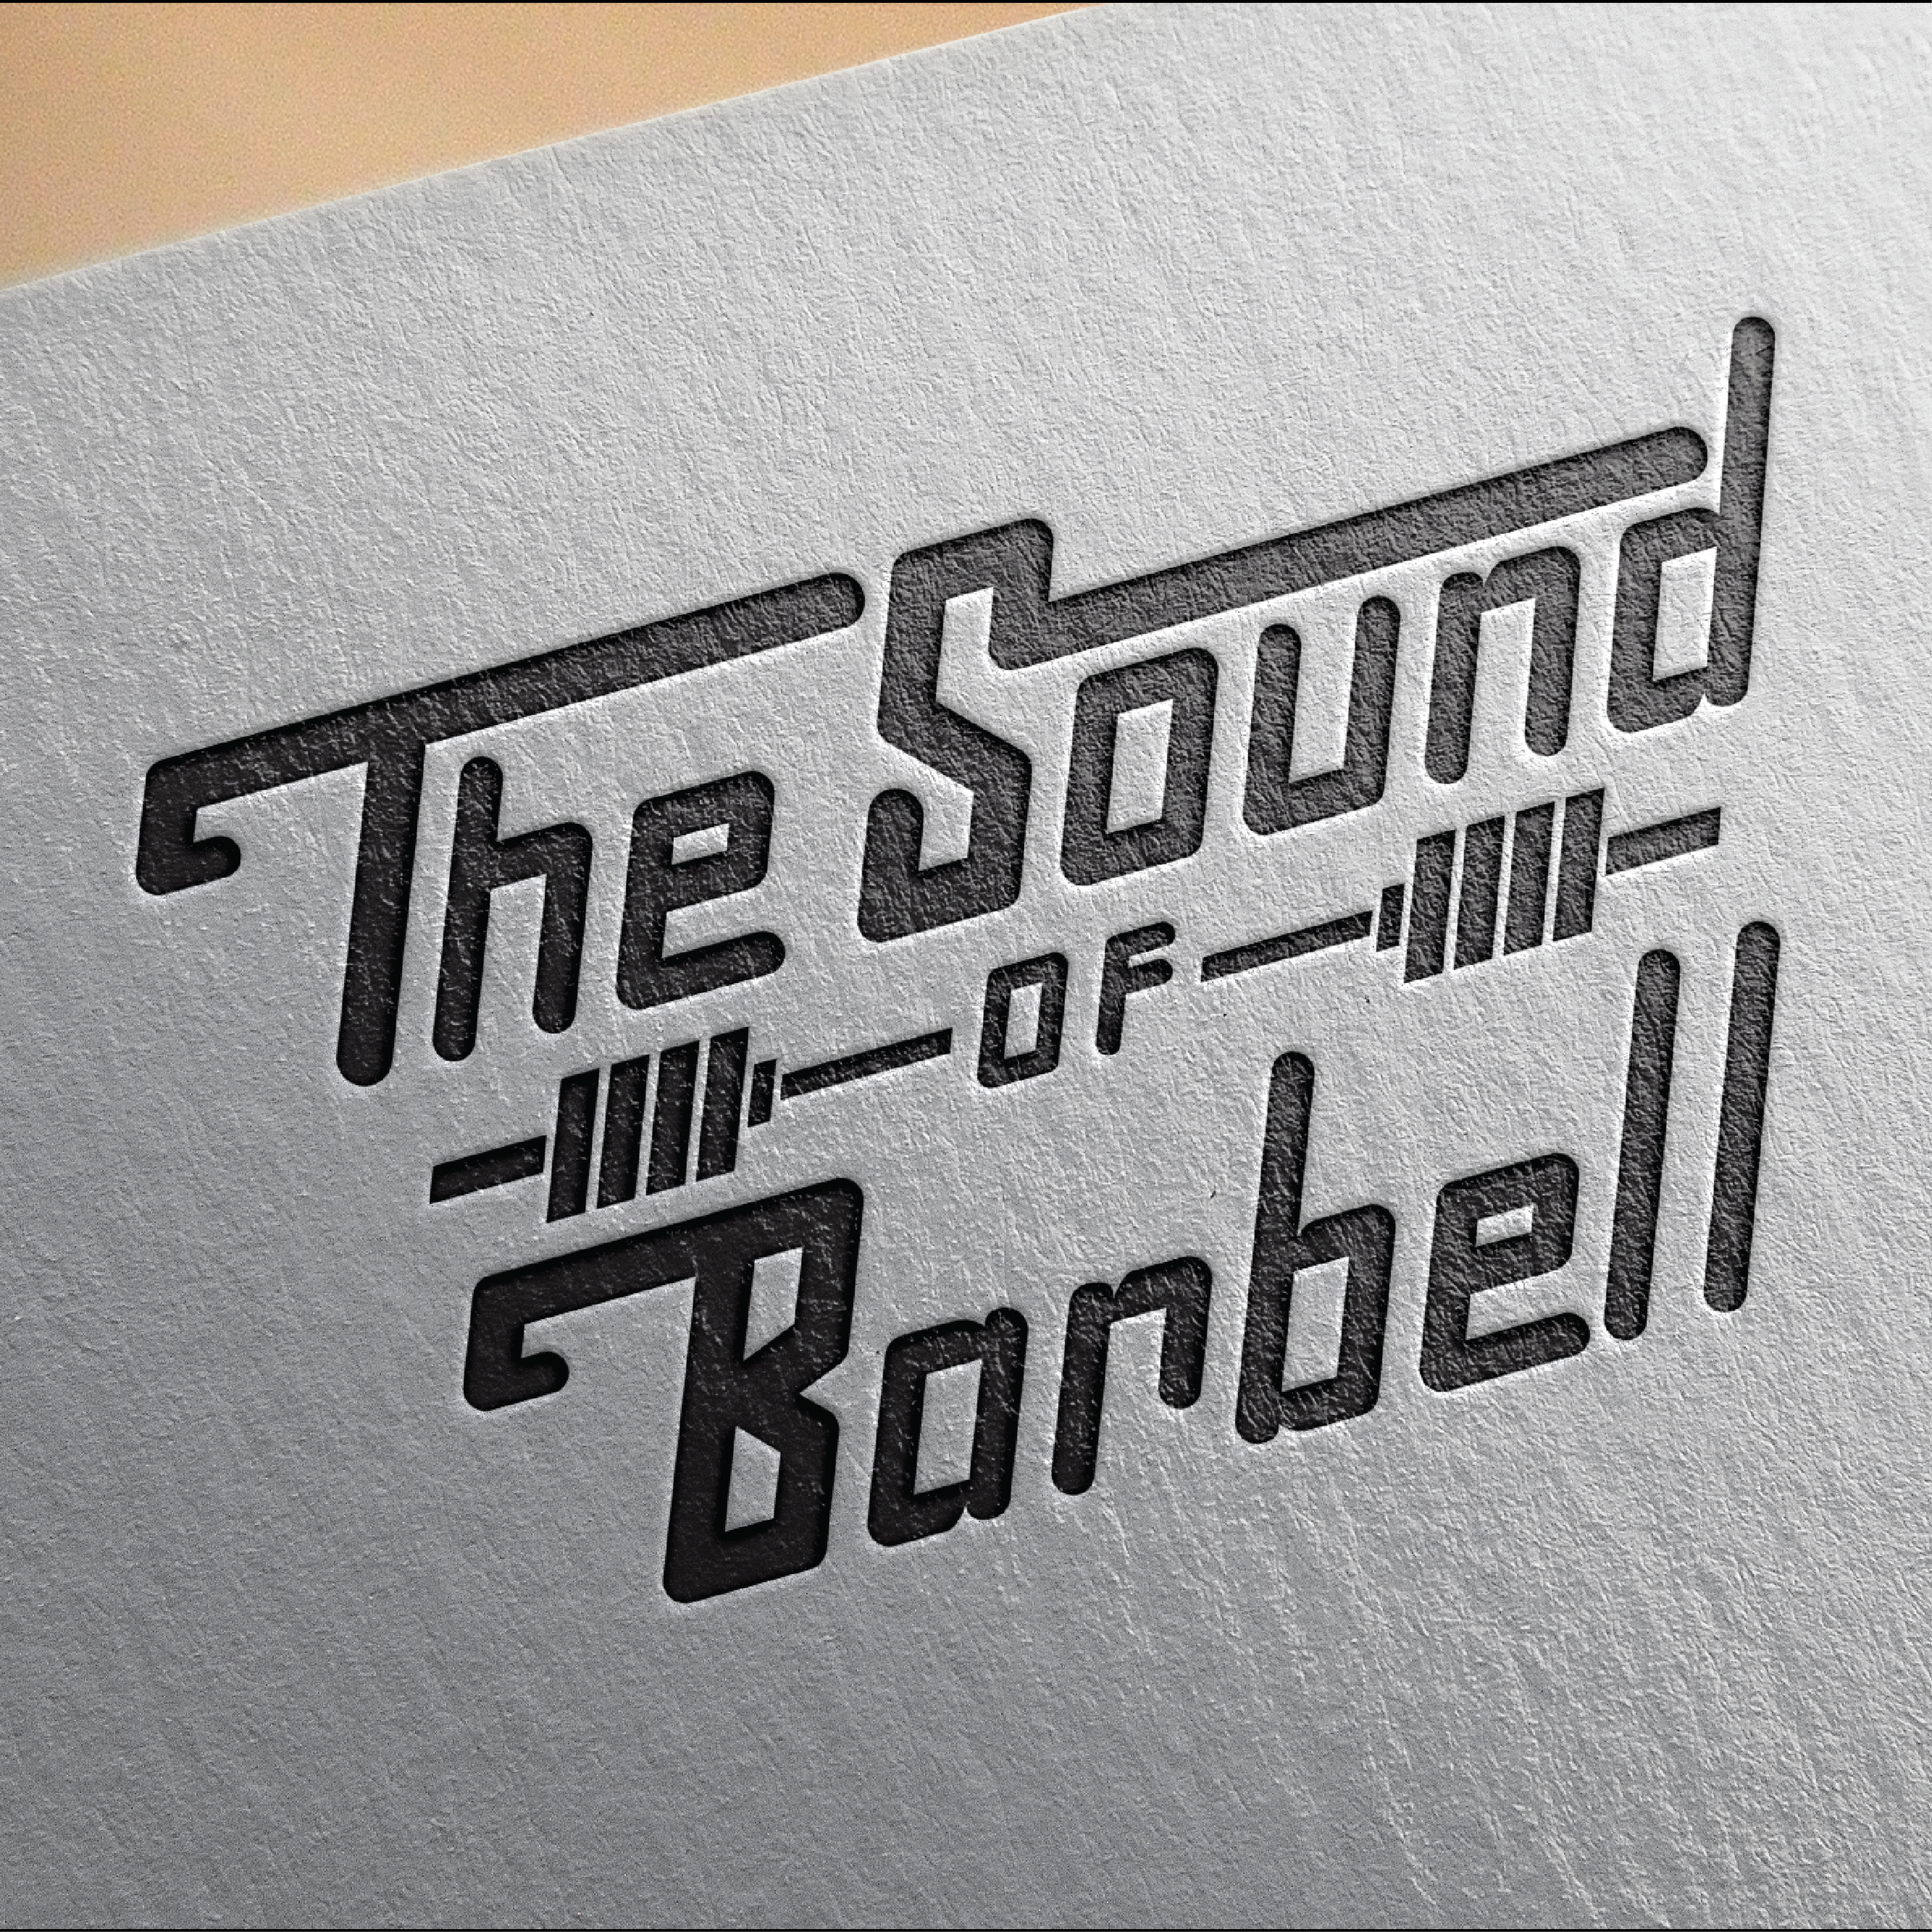 tsob-thesoundofbarbell-logo-brand-branding-black-white-vector-design-graphic-graphicdesign-lasvegas-graphicdesigner-vector-handtype-handletter-logos-minimal-logotype-mock.jpg